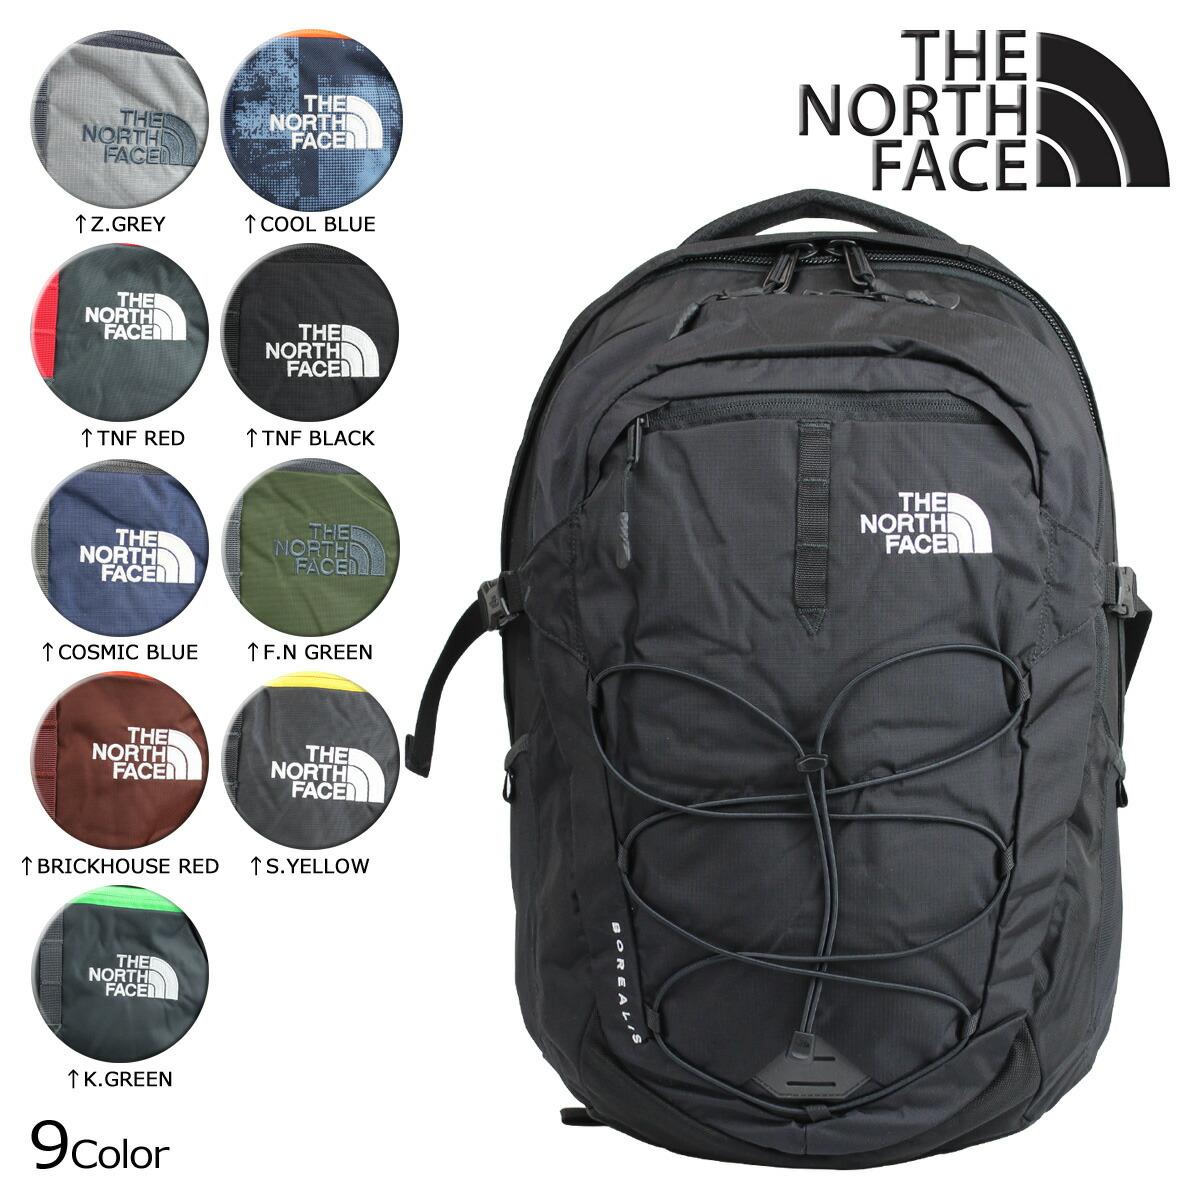 d9a4d187c Mens North Face Backpacks - CEAGESP